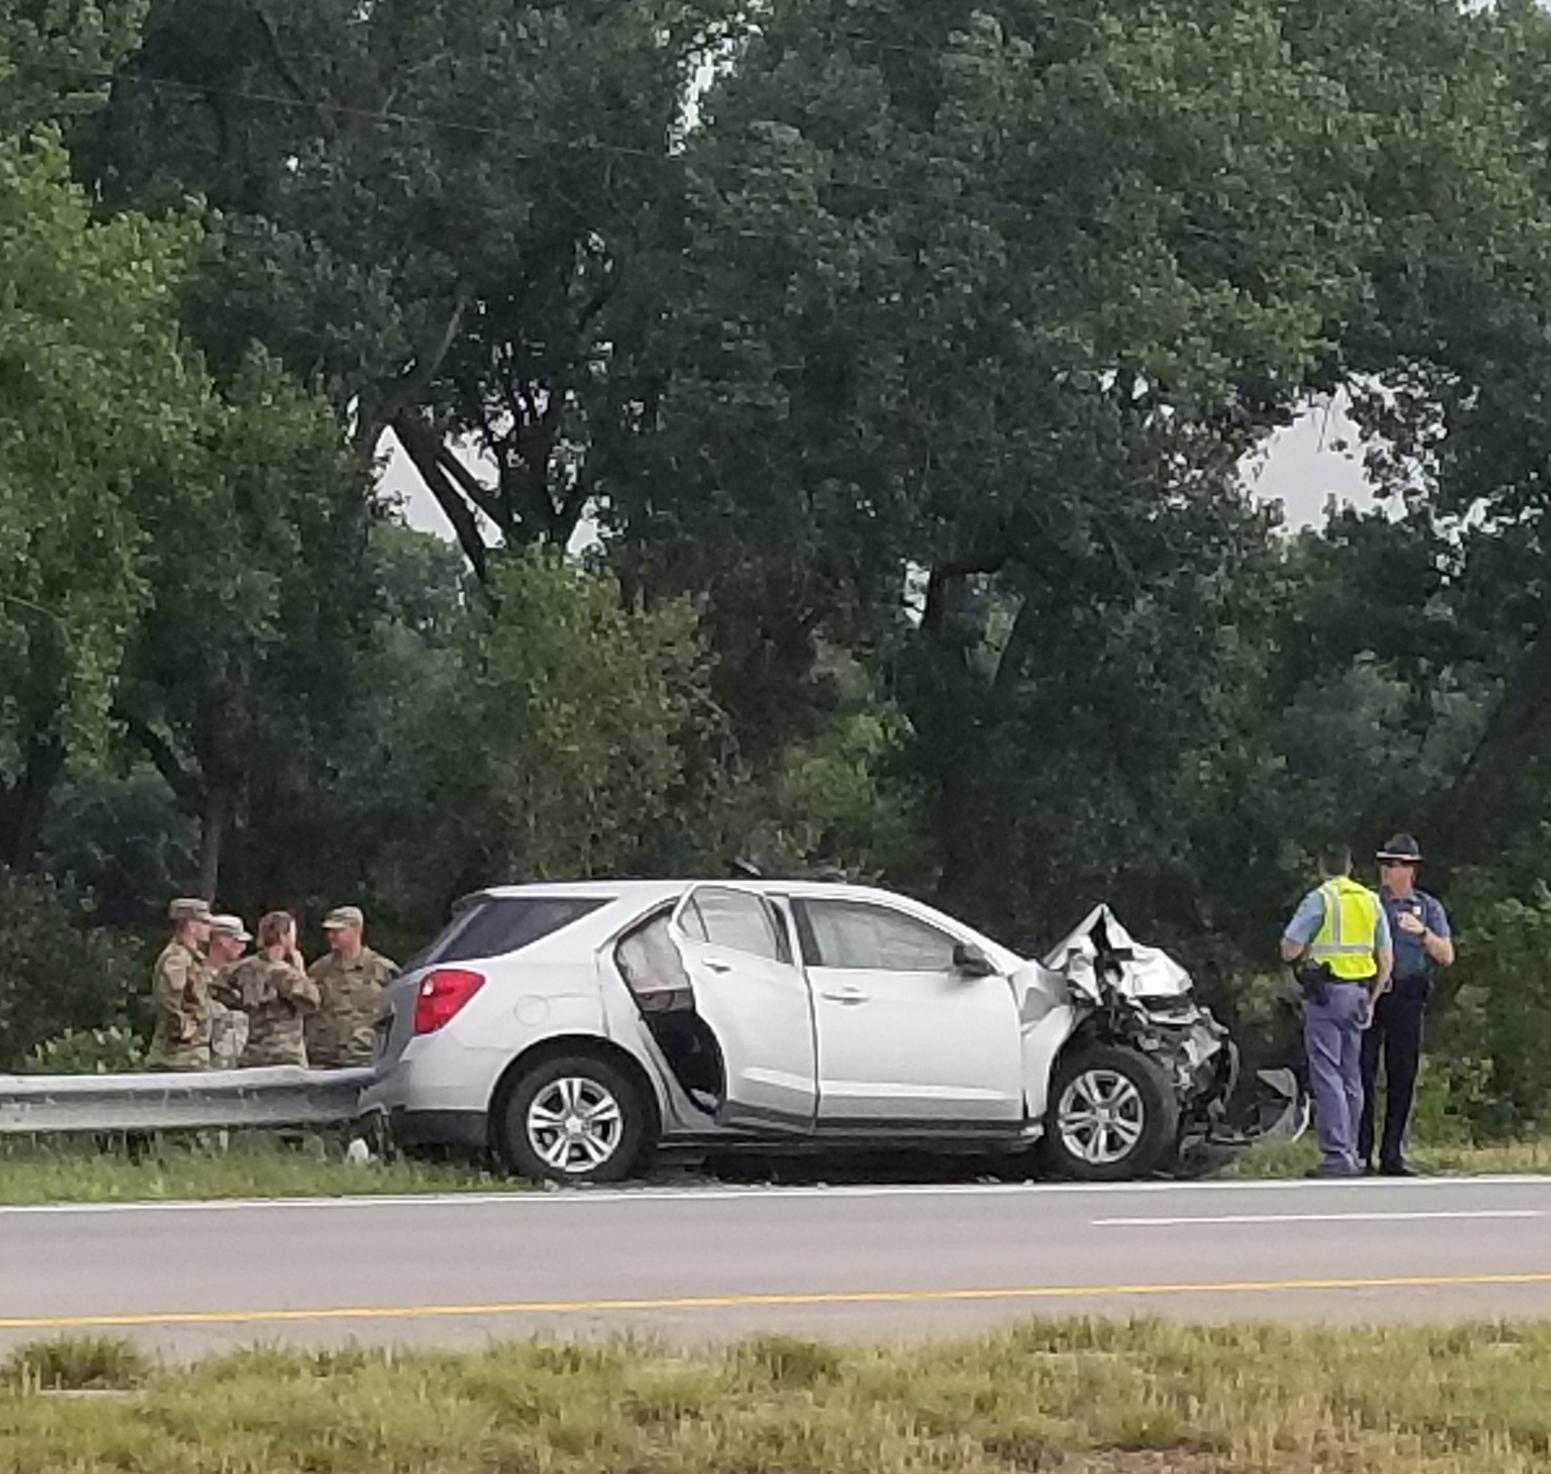 3 Hurt In Crash Involving Military Vehicle